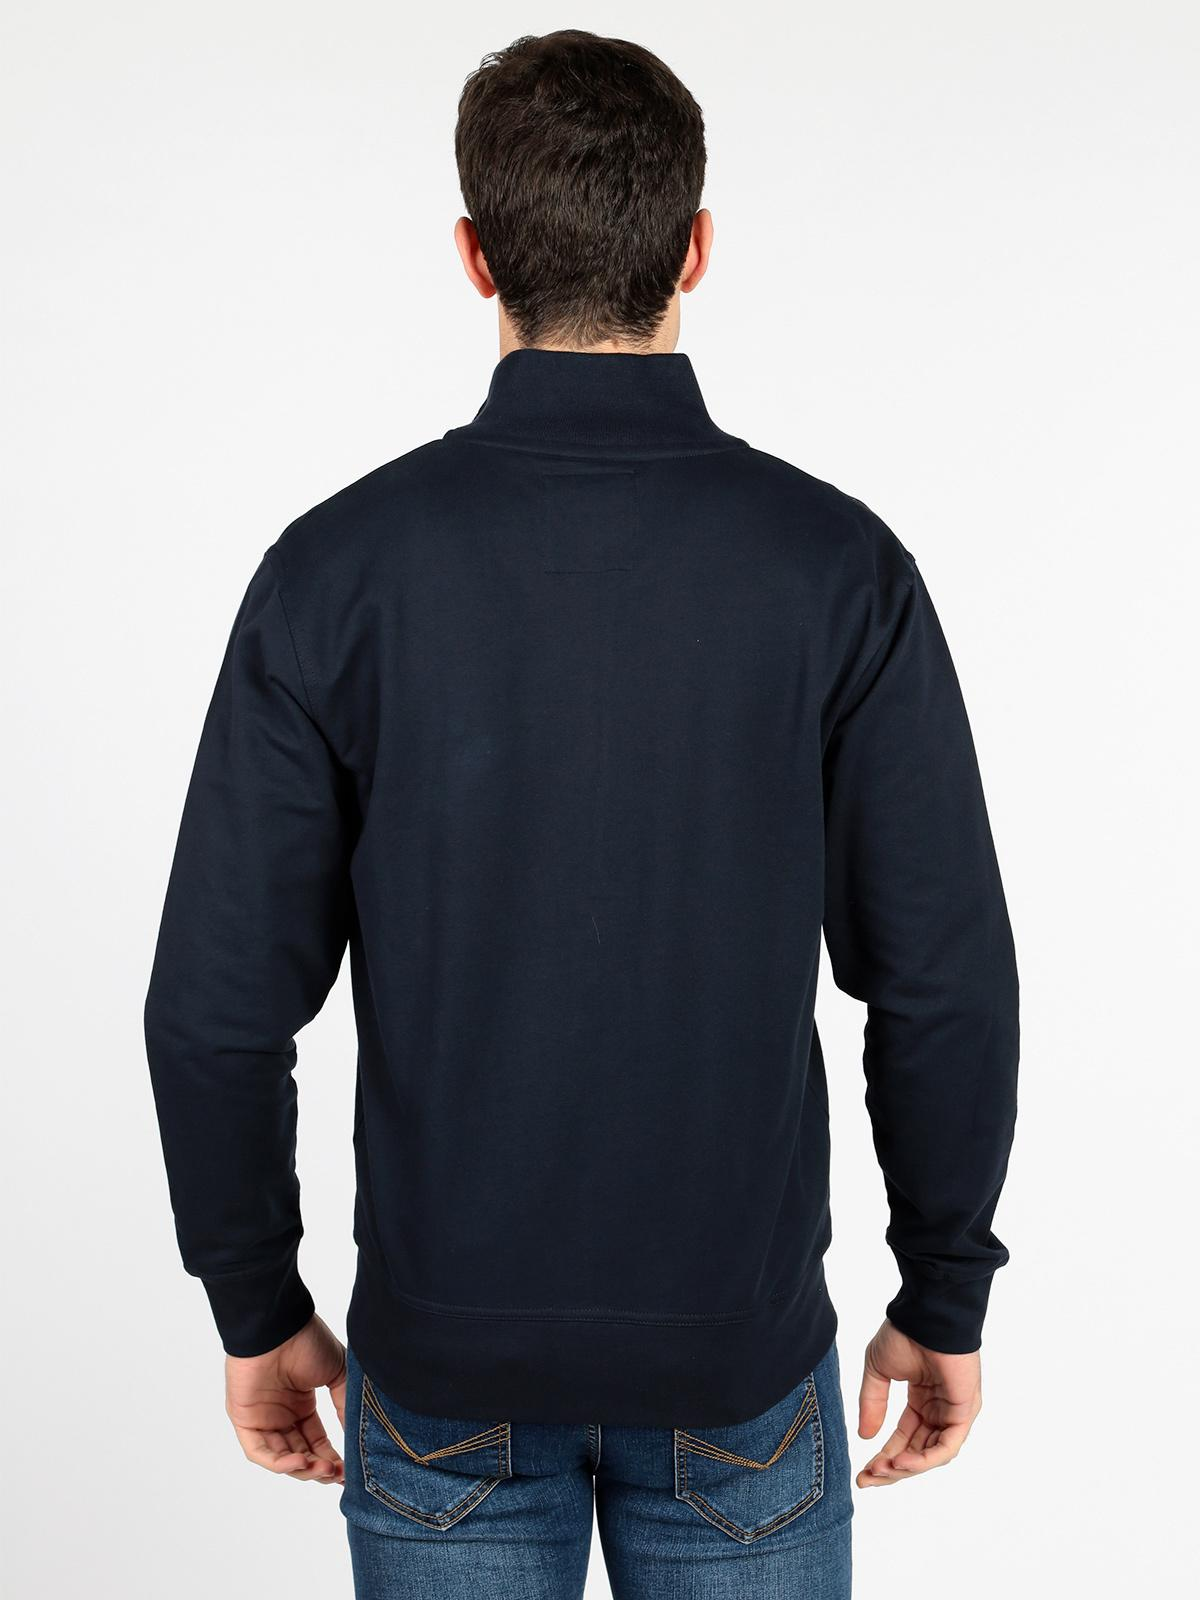 sito affidabile af2ba 58c4b Felpa a collo alto full zip in cotone be board | MecShopping